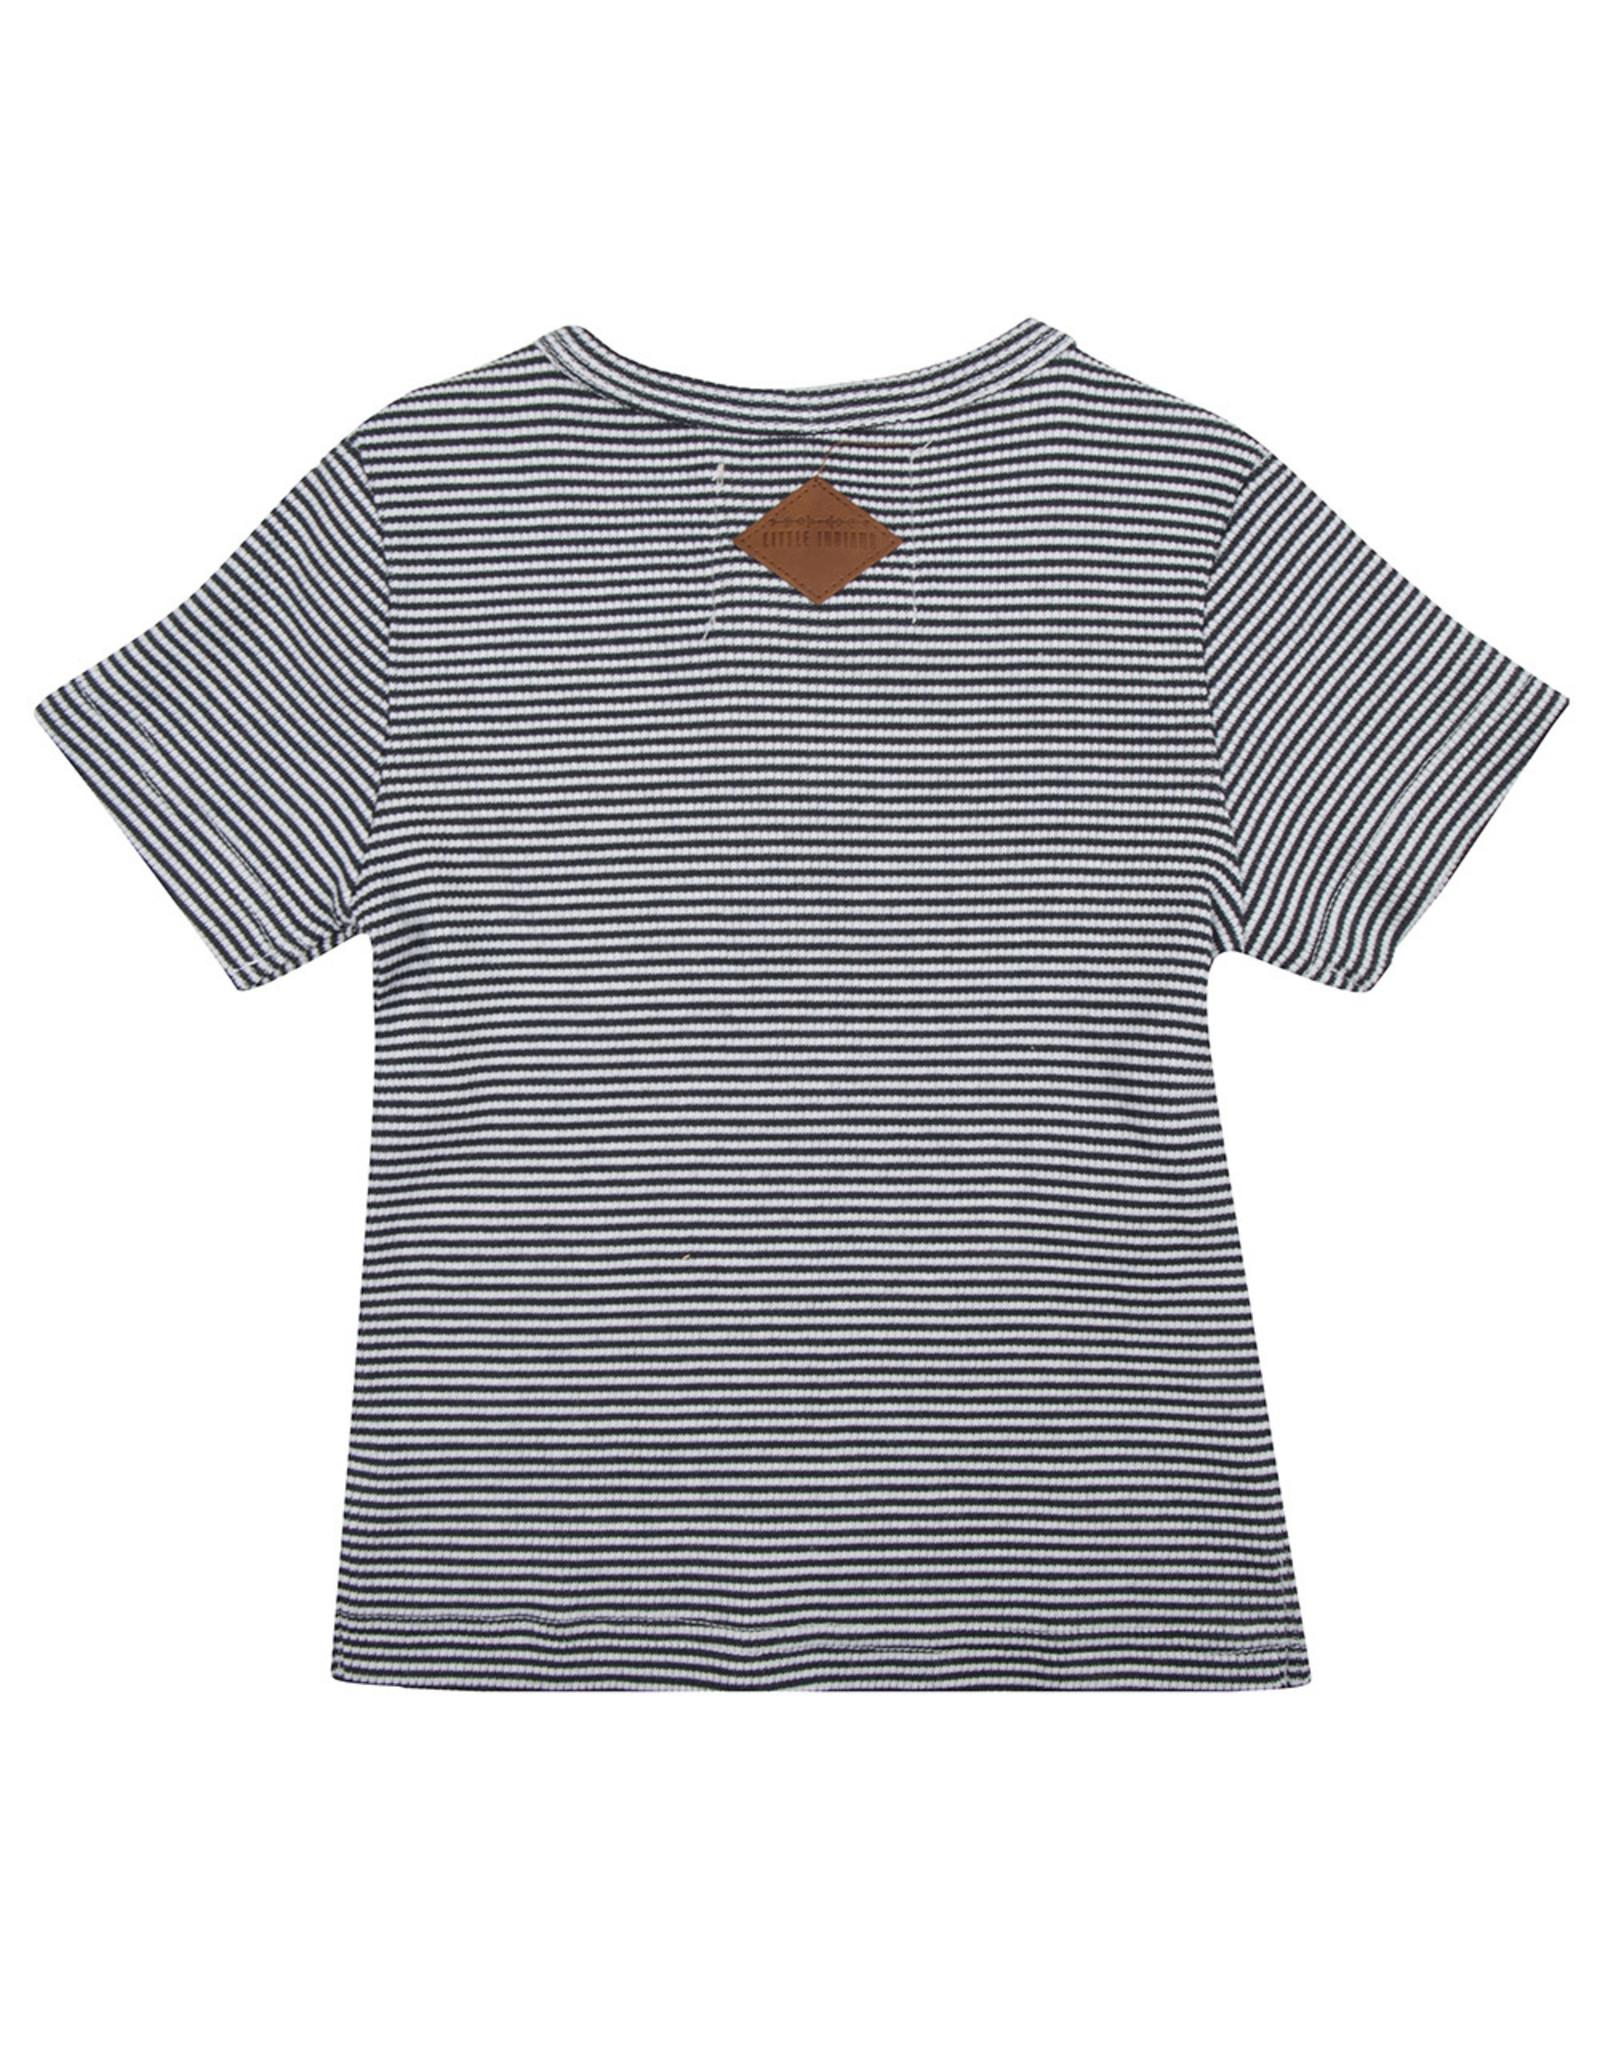 Little Indians Shirt Balloon - Small Stripe Rib